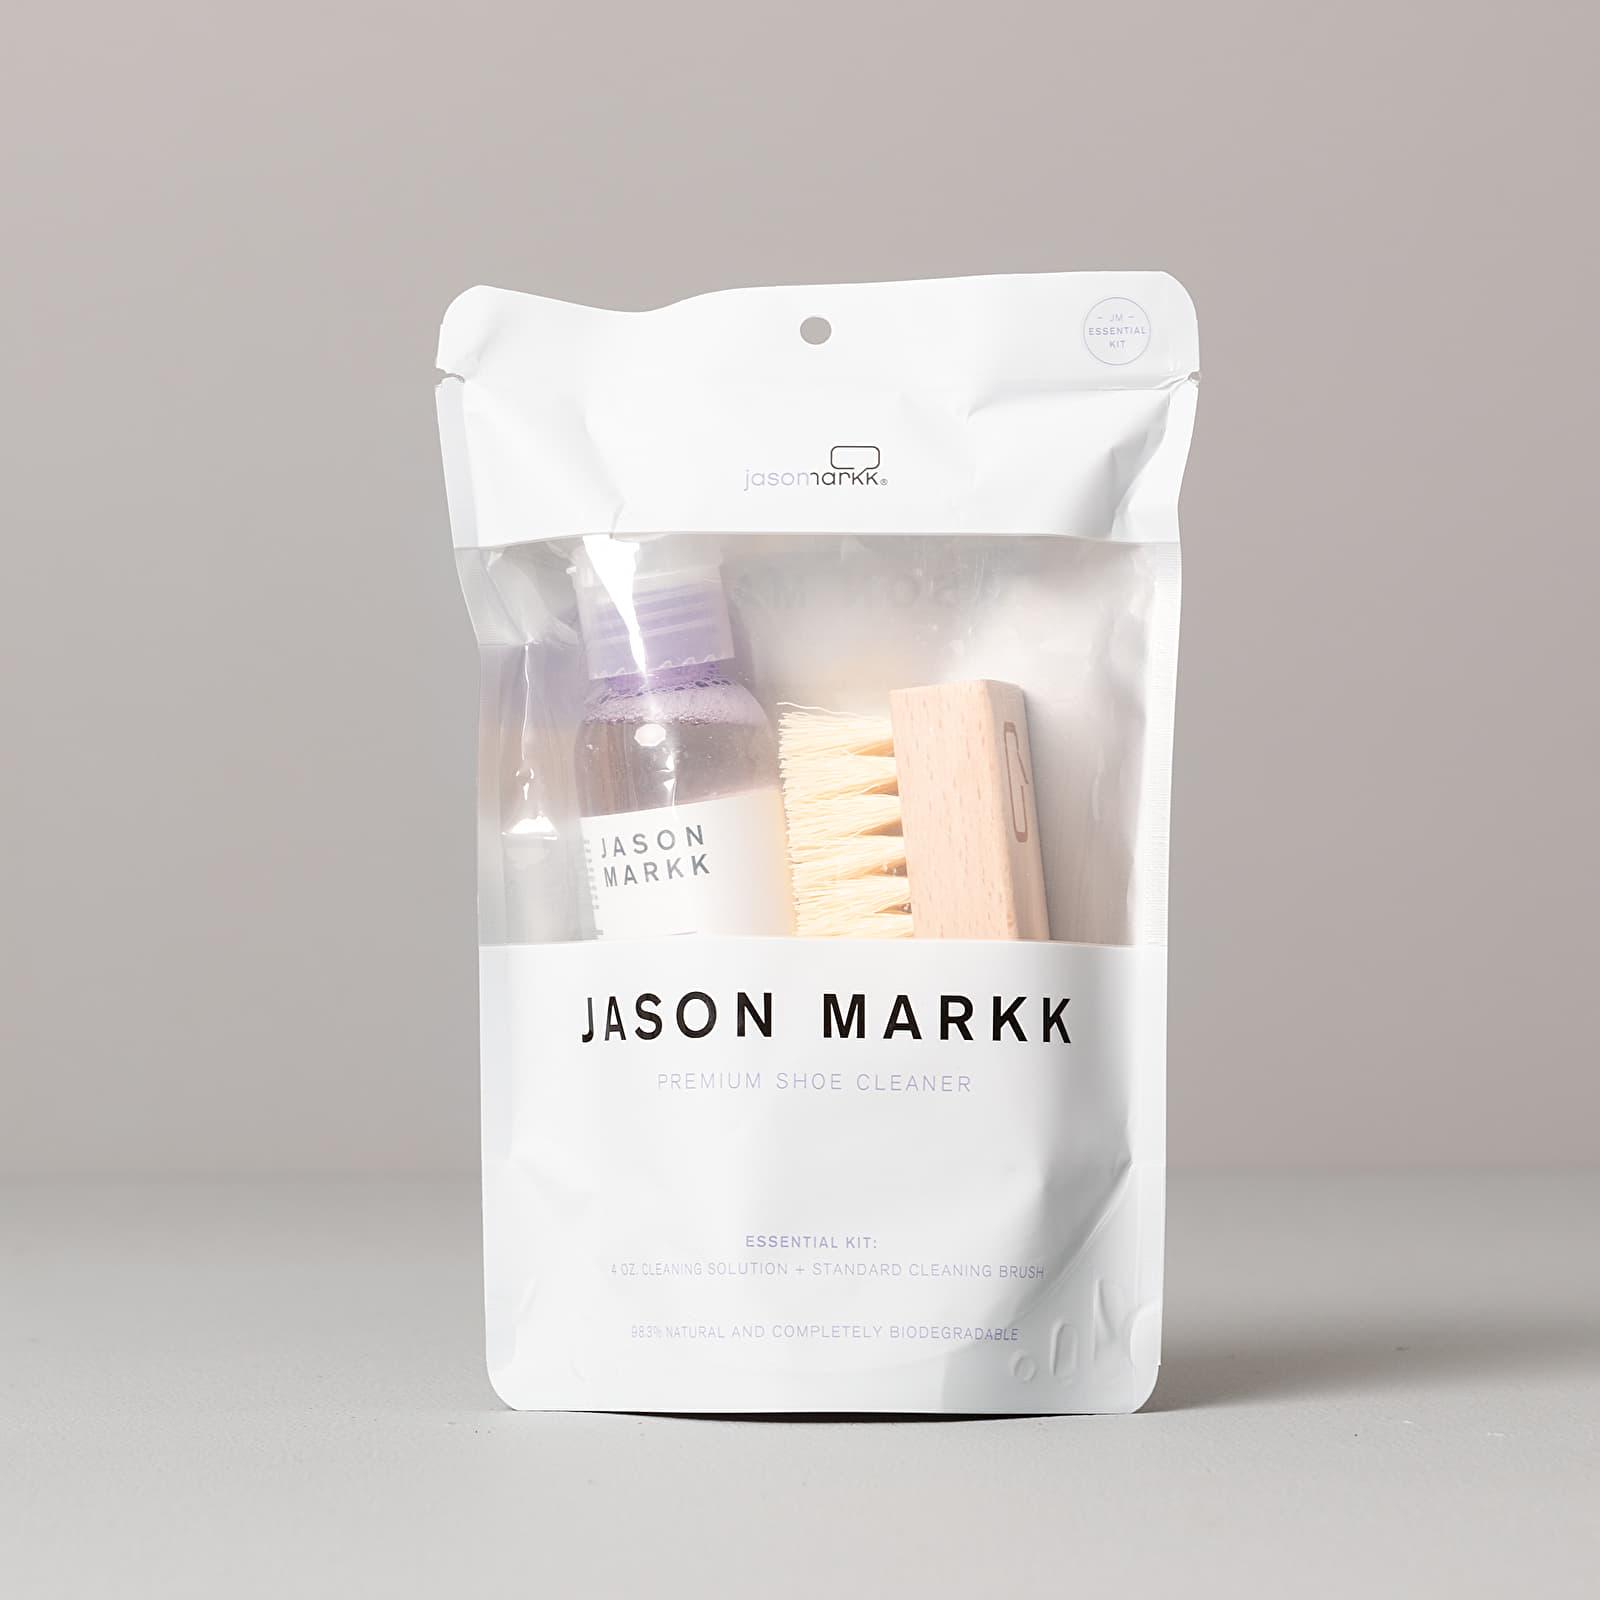 Accesorios Jason Markk Essential Kit